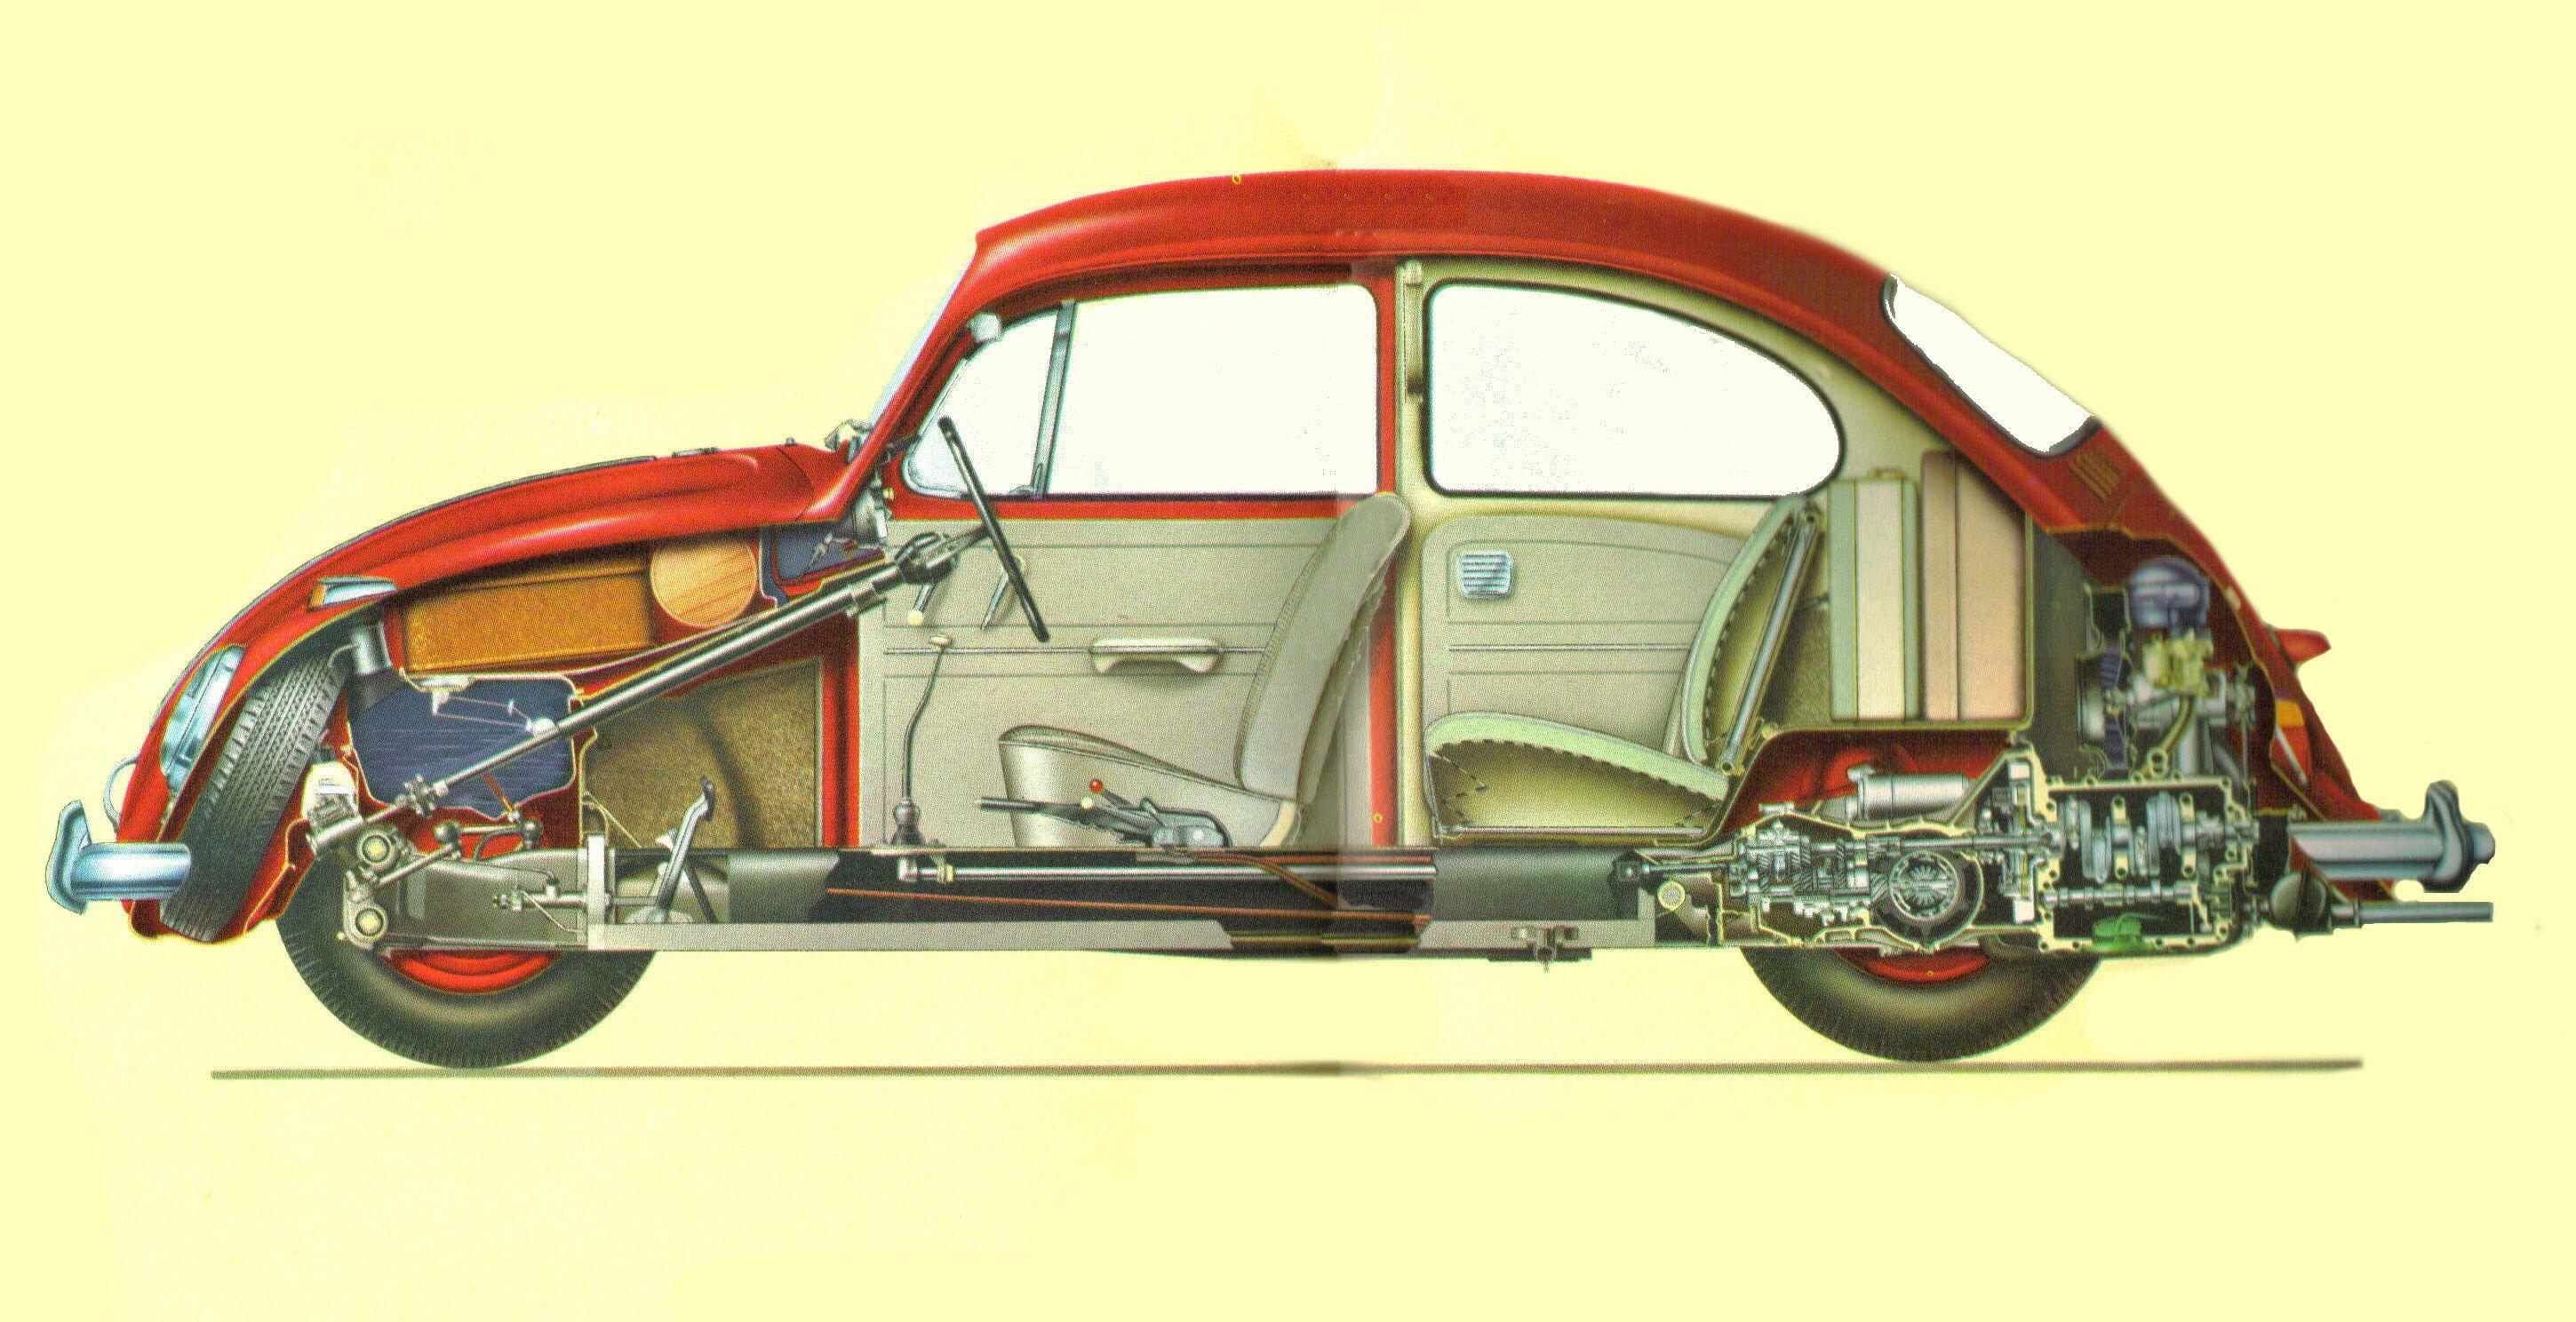 price vw title sale living volkswagen vehicles carsedan for sport qatar beetle